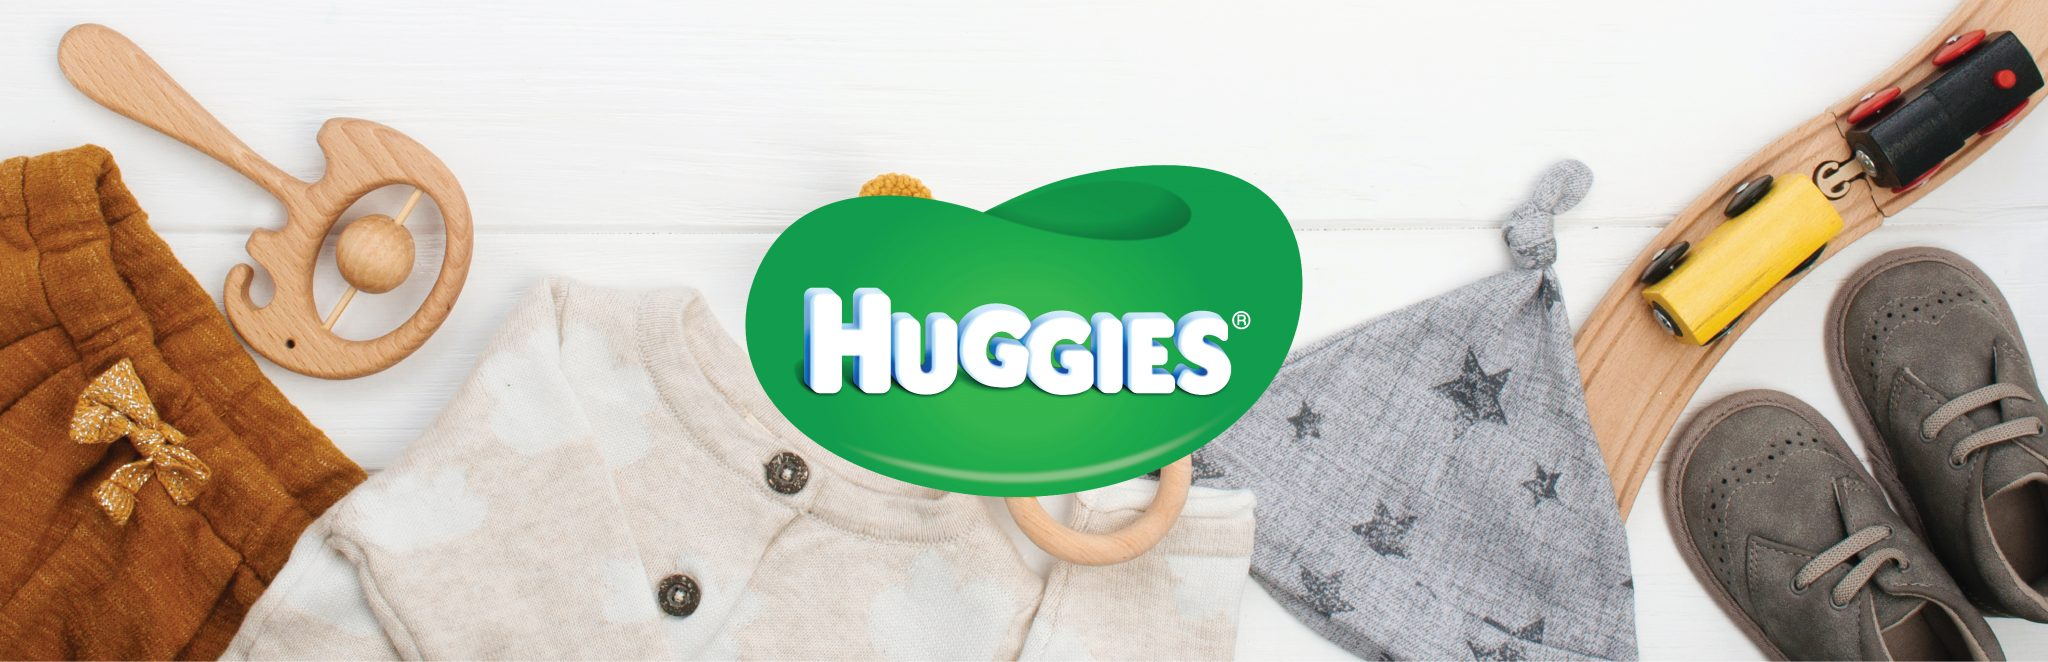 האגיס